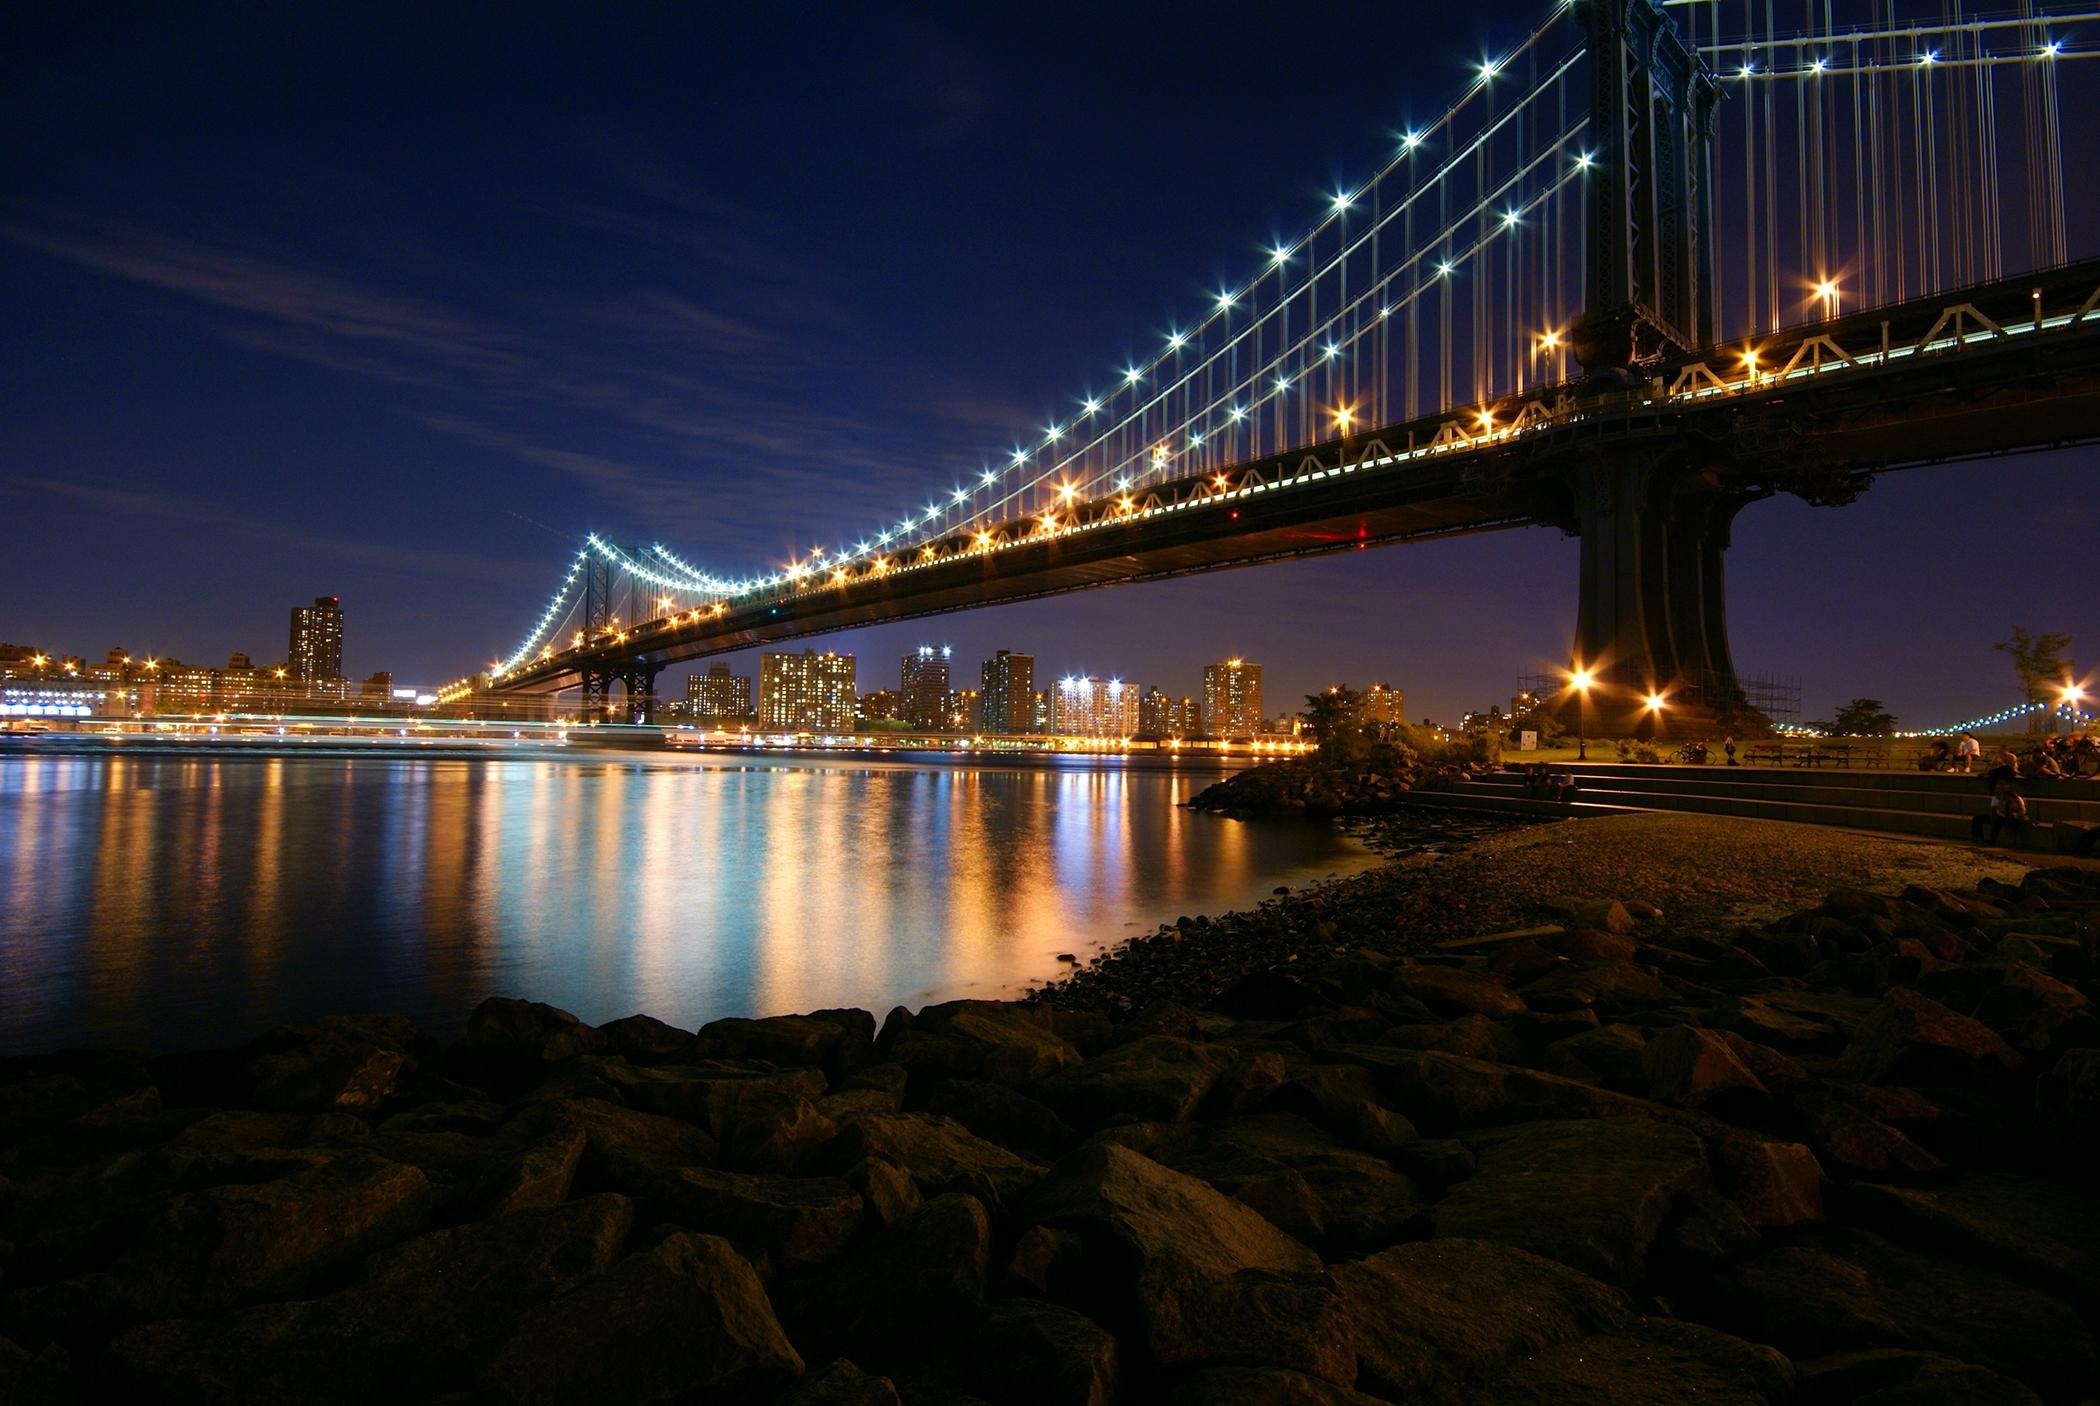 Manhattan_Bridge_at_Night.JPG